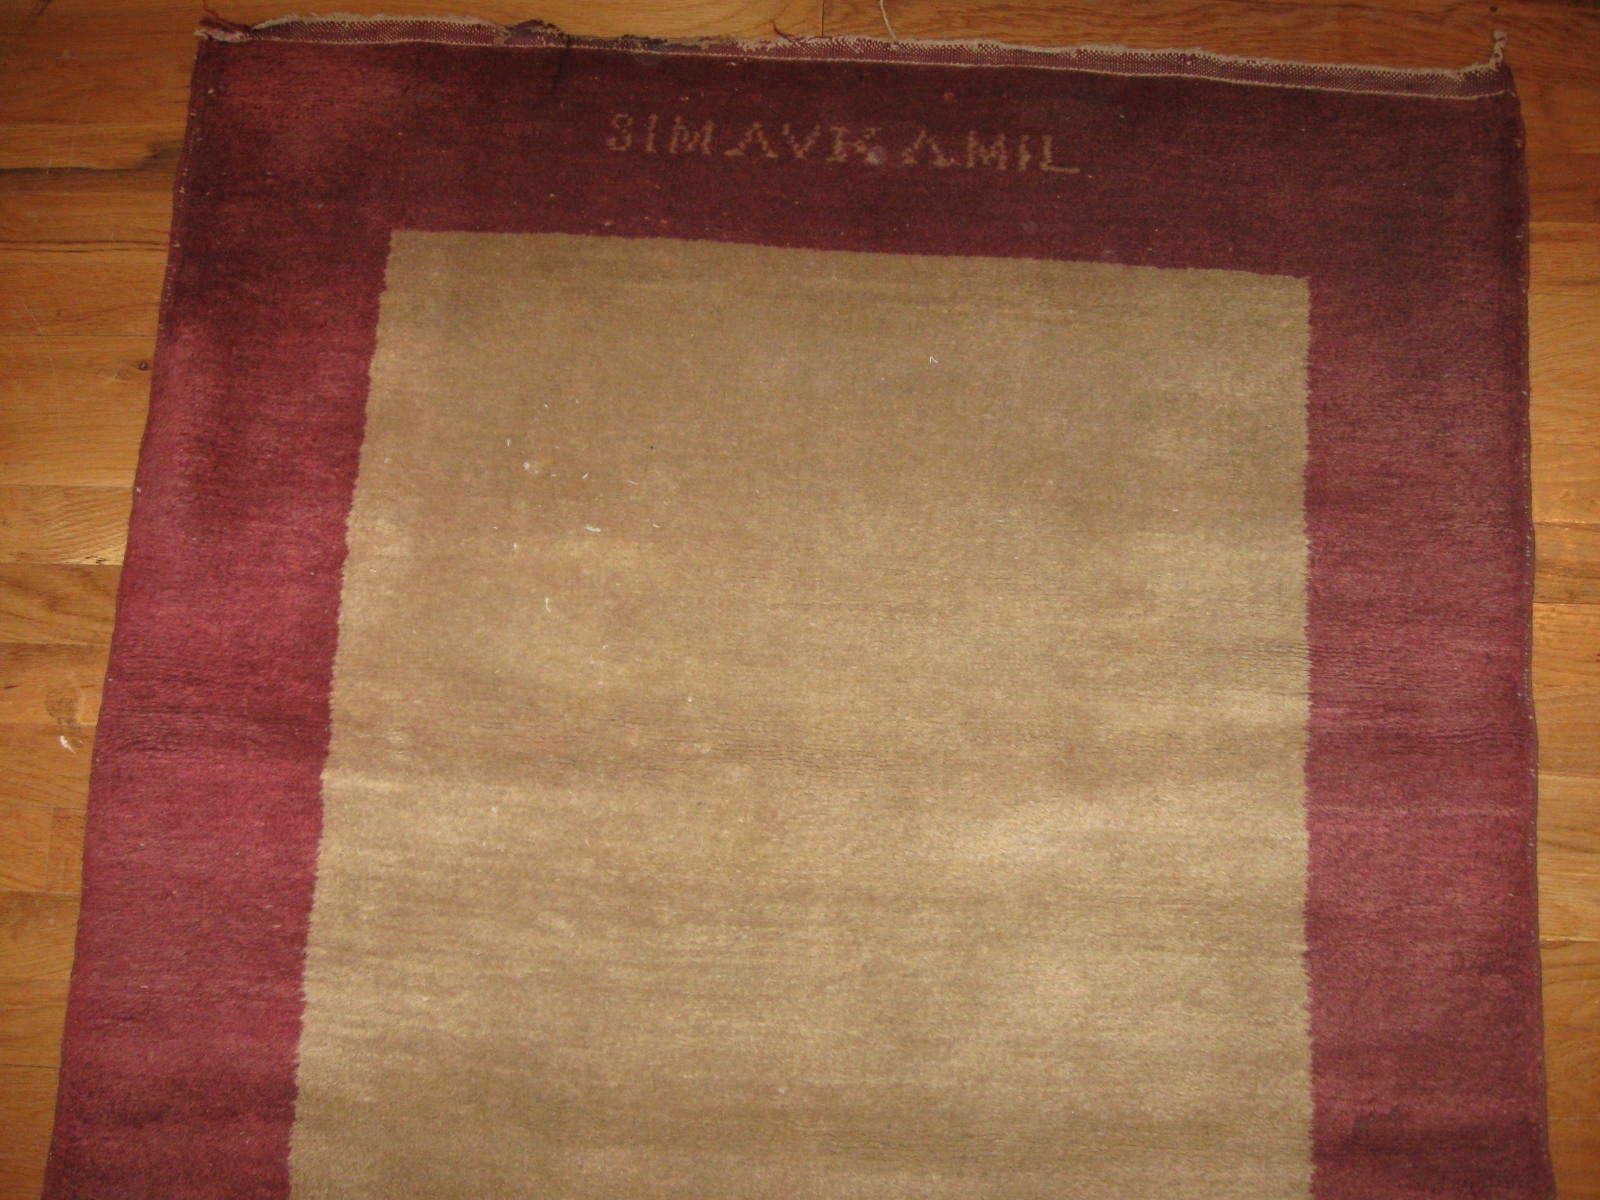 24260 Chinese Fetti hall runner rug 3,3 x 19,6 (2)